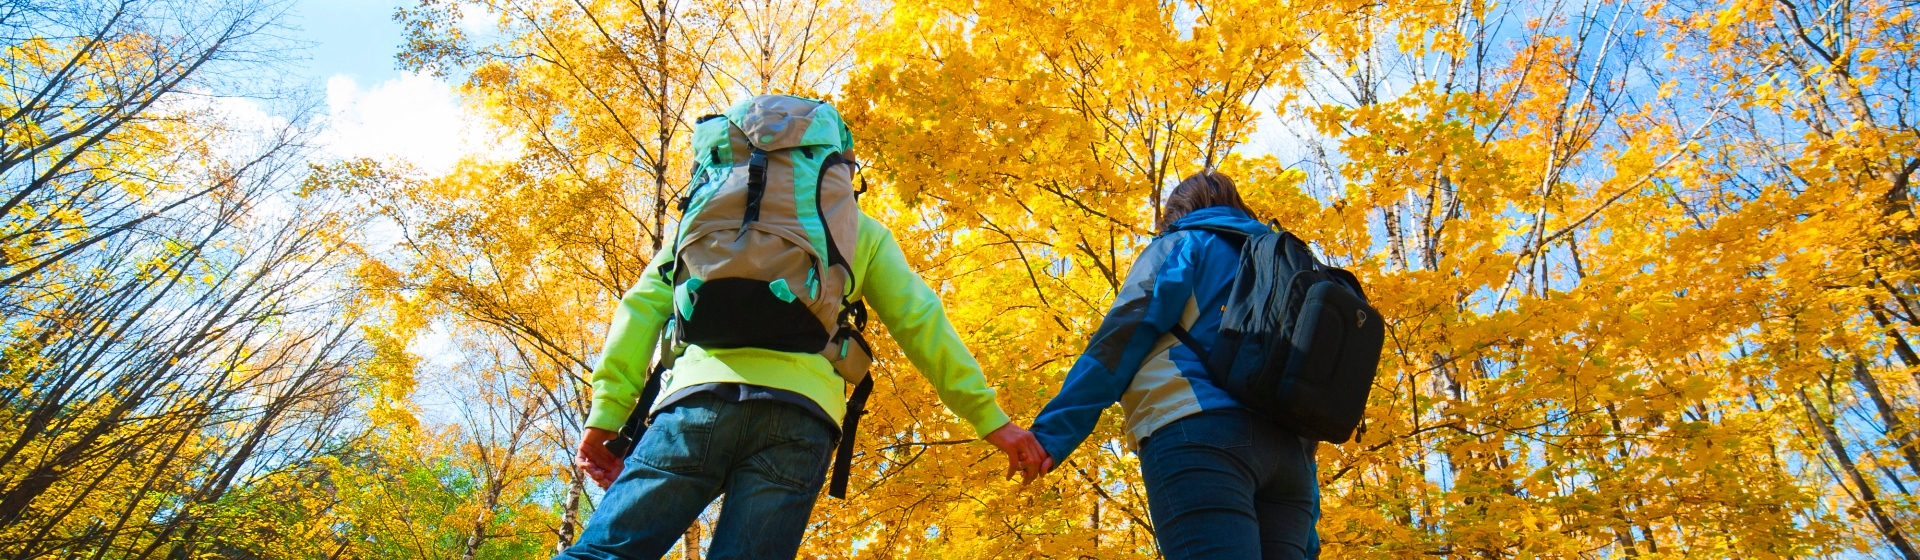 Backpackers gaze at fall foliage